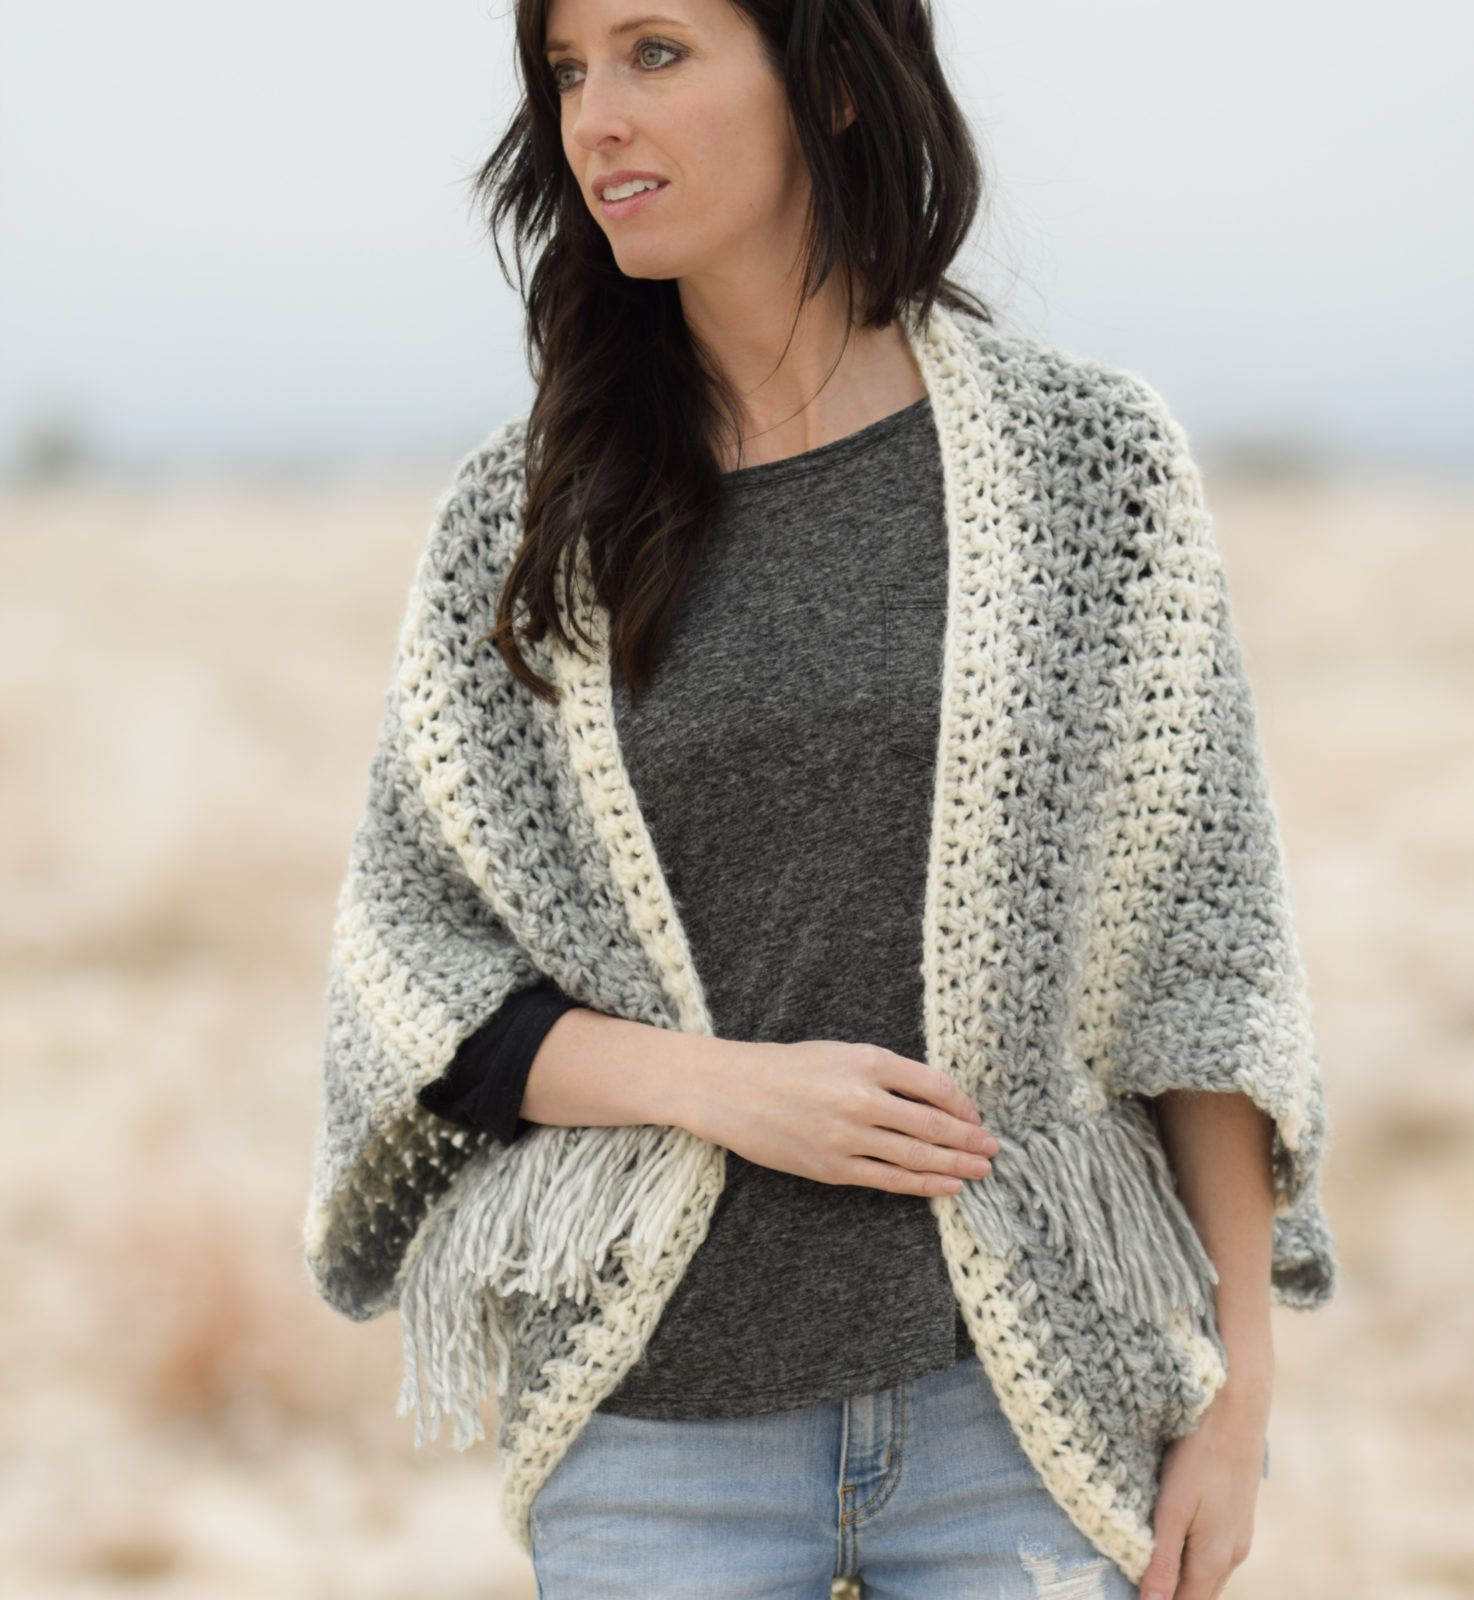 Lion brand scarfie easy blanket sweater pattern grey 3 crochet lion brand scarfie easy blanket sweater pattern grey bankloansurffo Images